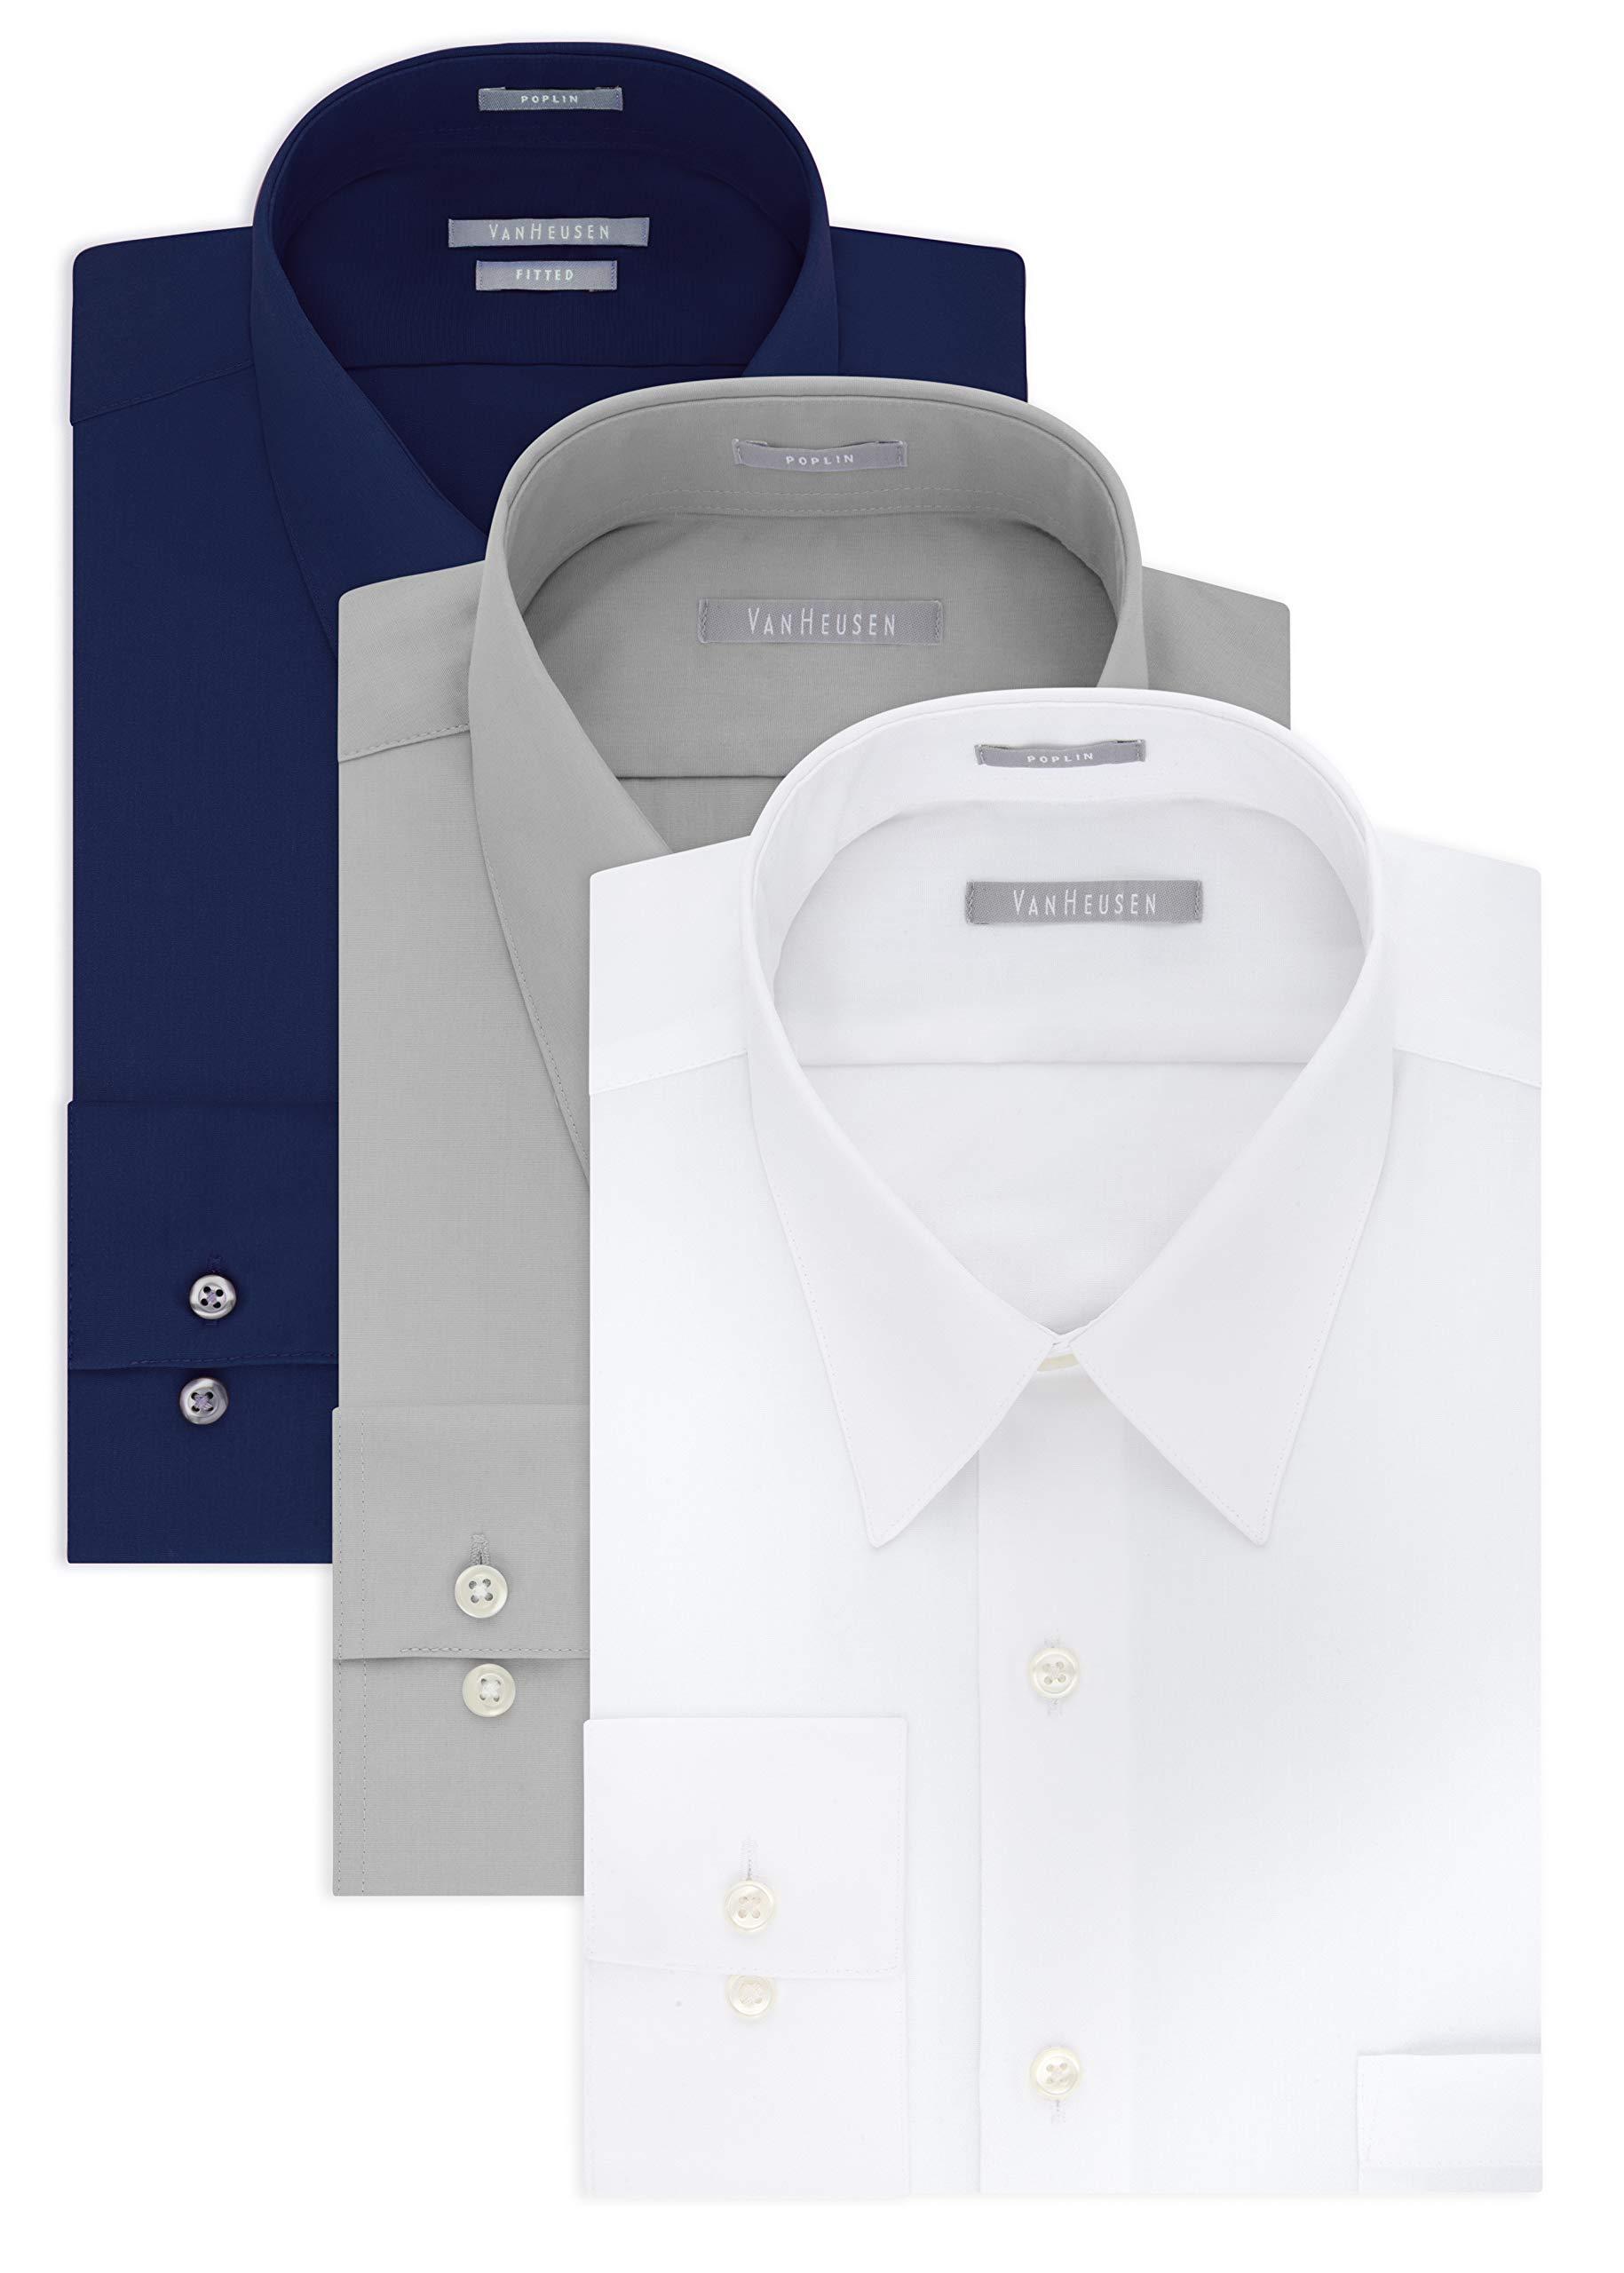 Van Heusen Men's Poplin Fitted Solid Point Collar Dress Shirt, White/Grey Stone/Persian Blue, 17.5''